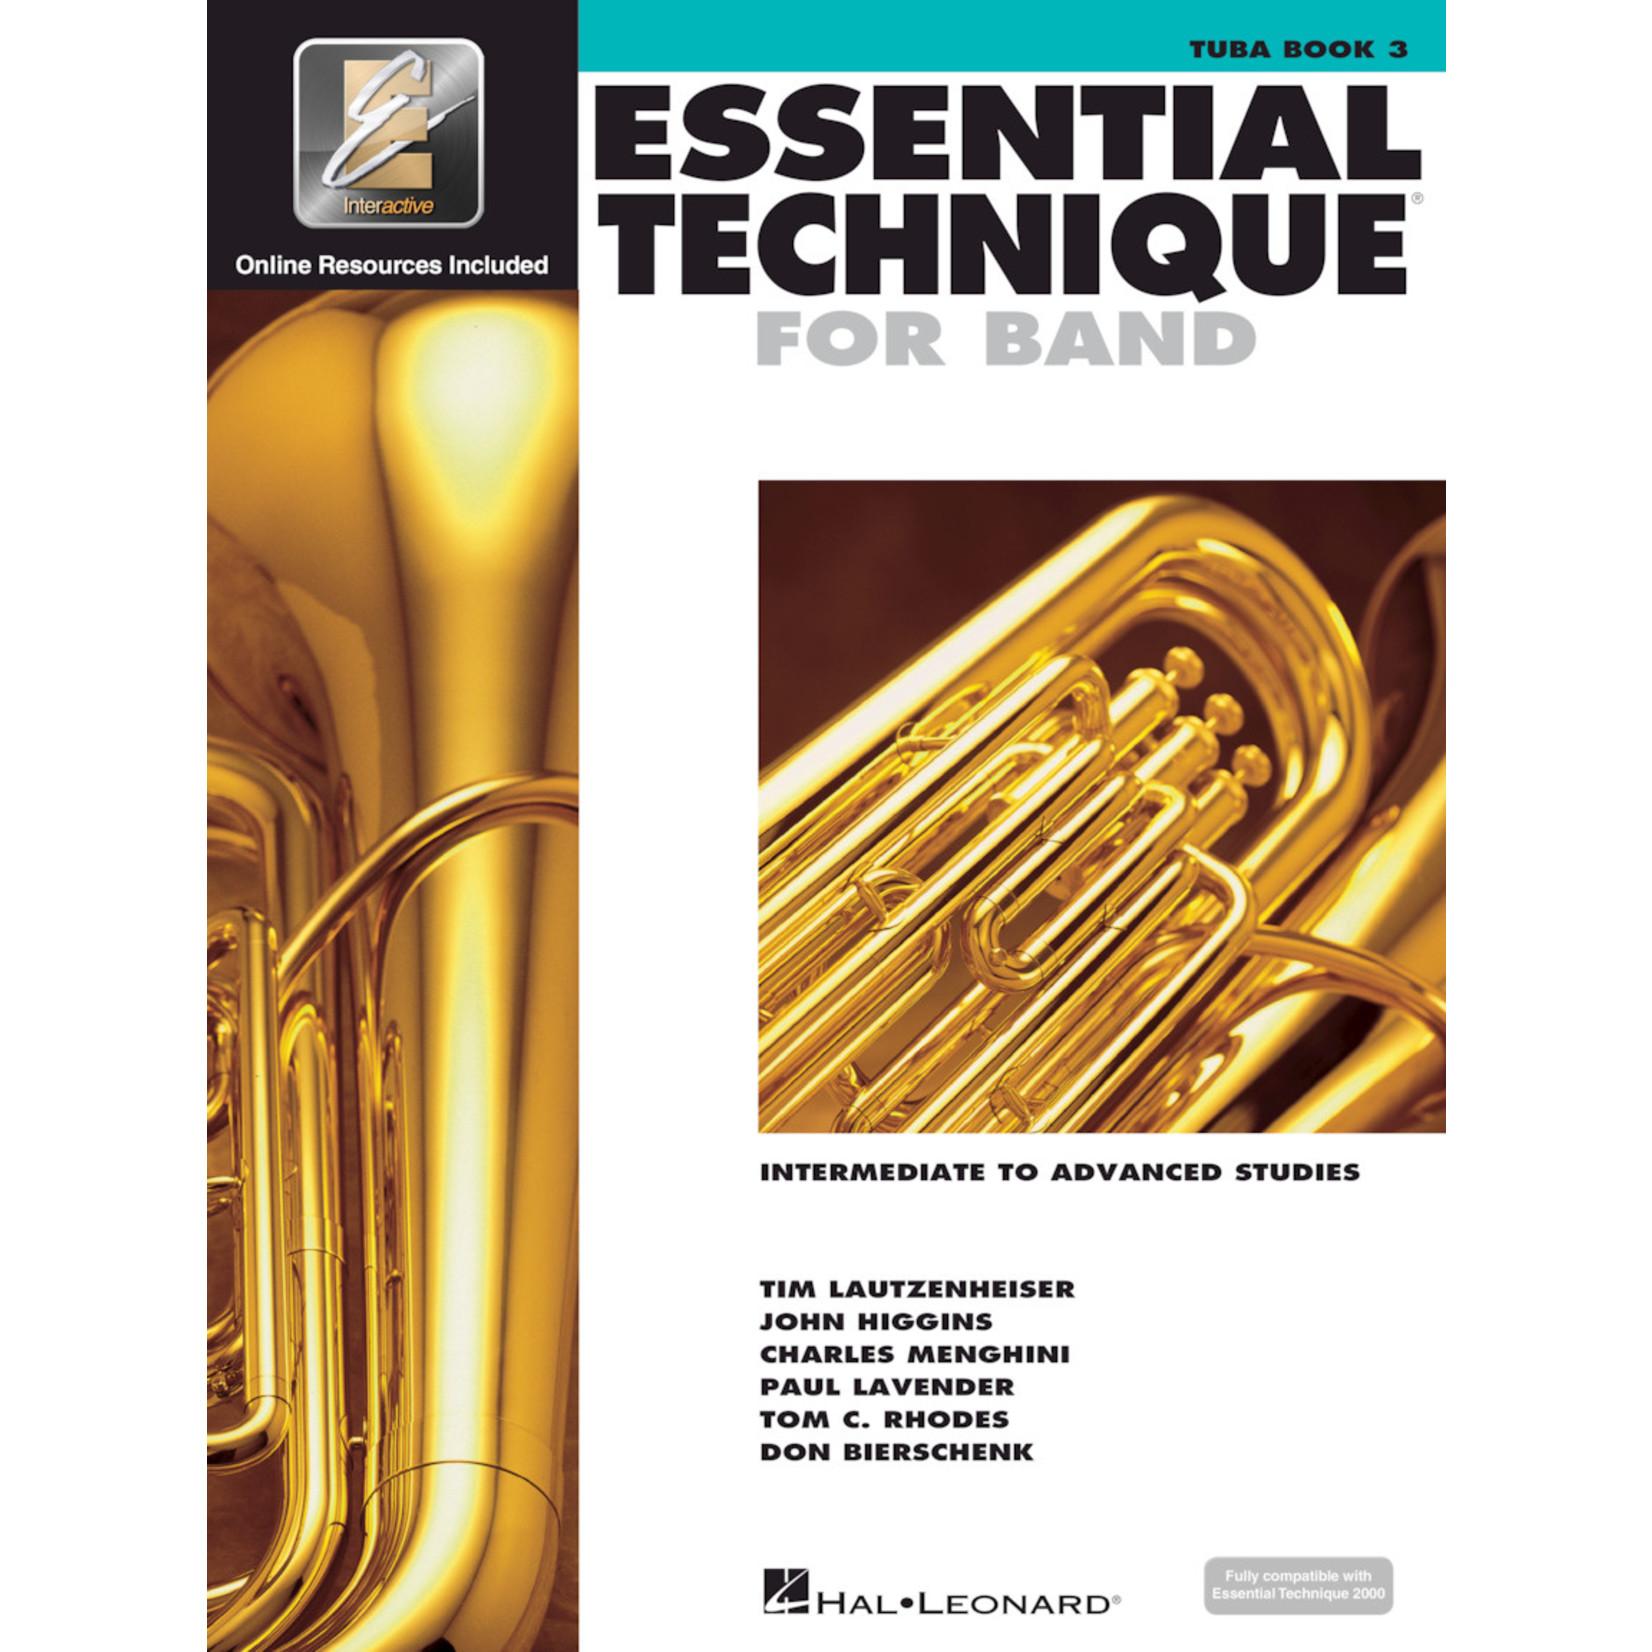 Hal Leonard Essential Technique for Band Tuba Book 3